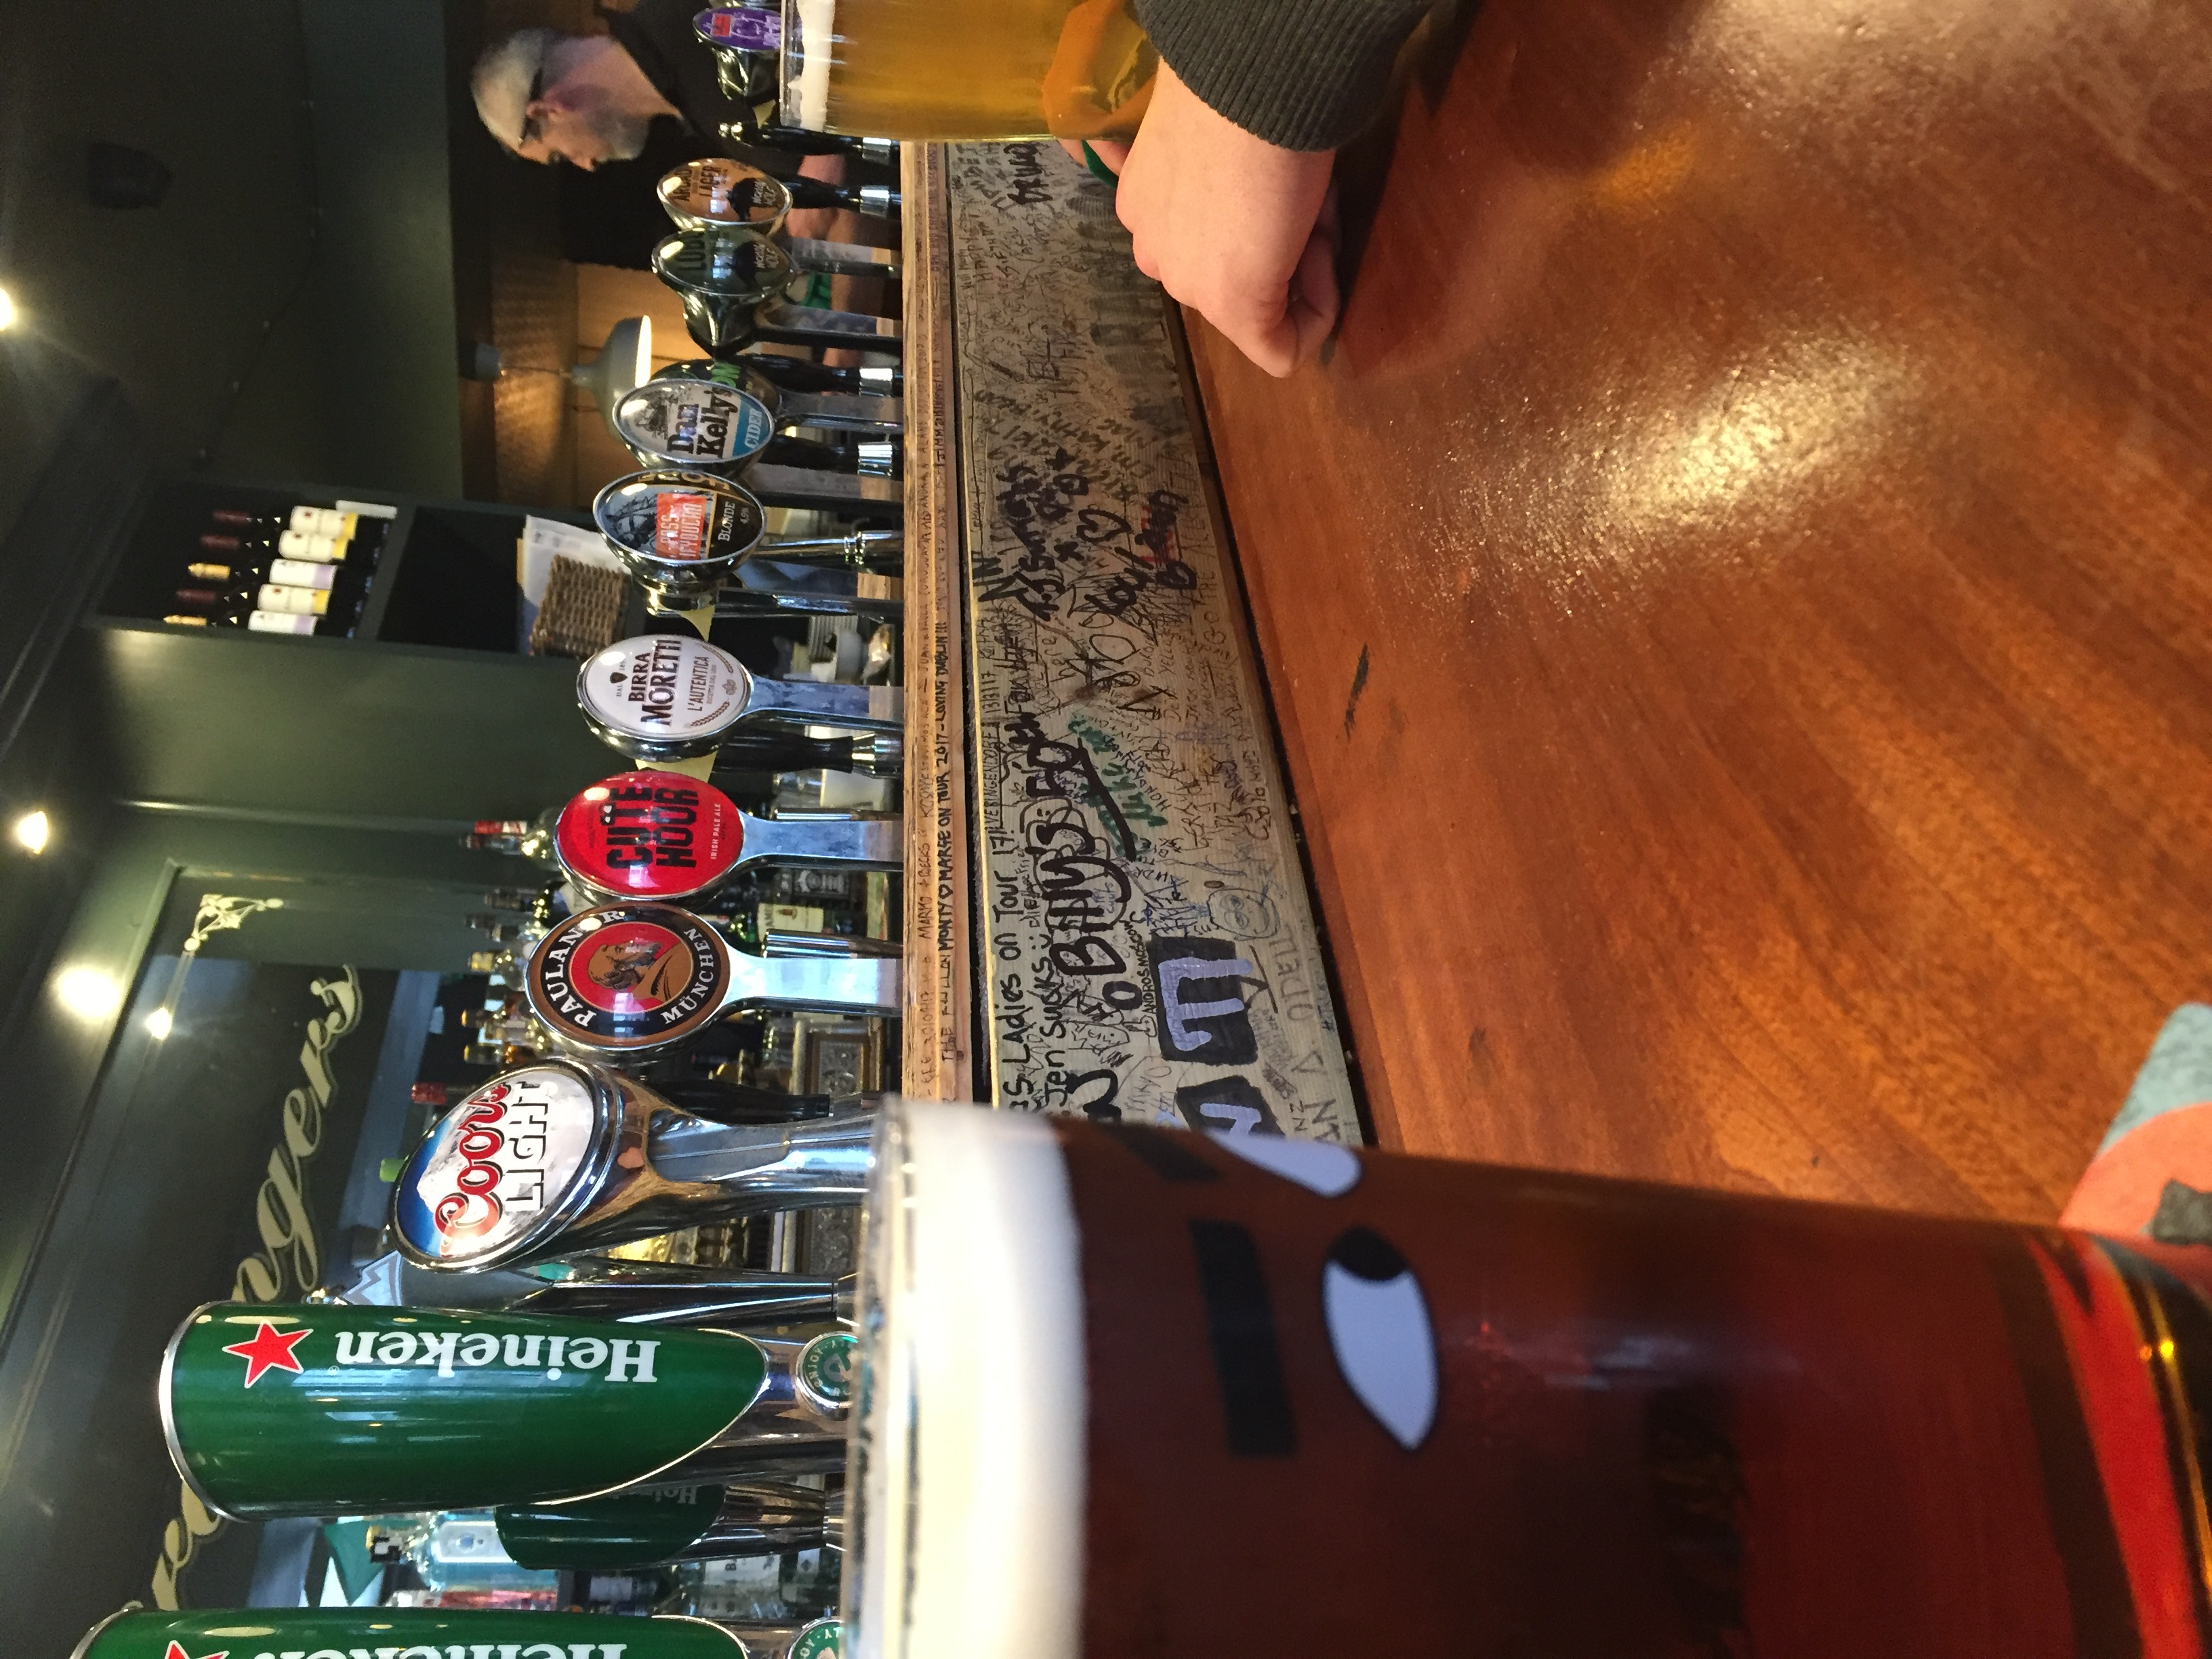 Bar Hopping in Ireland